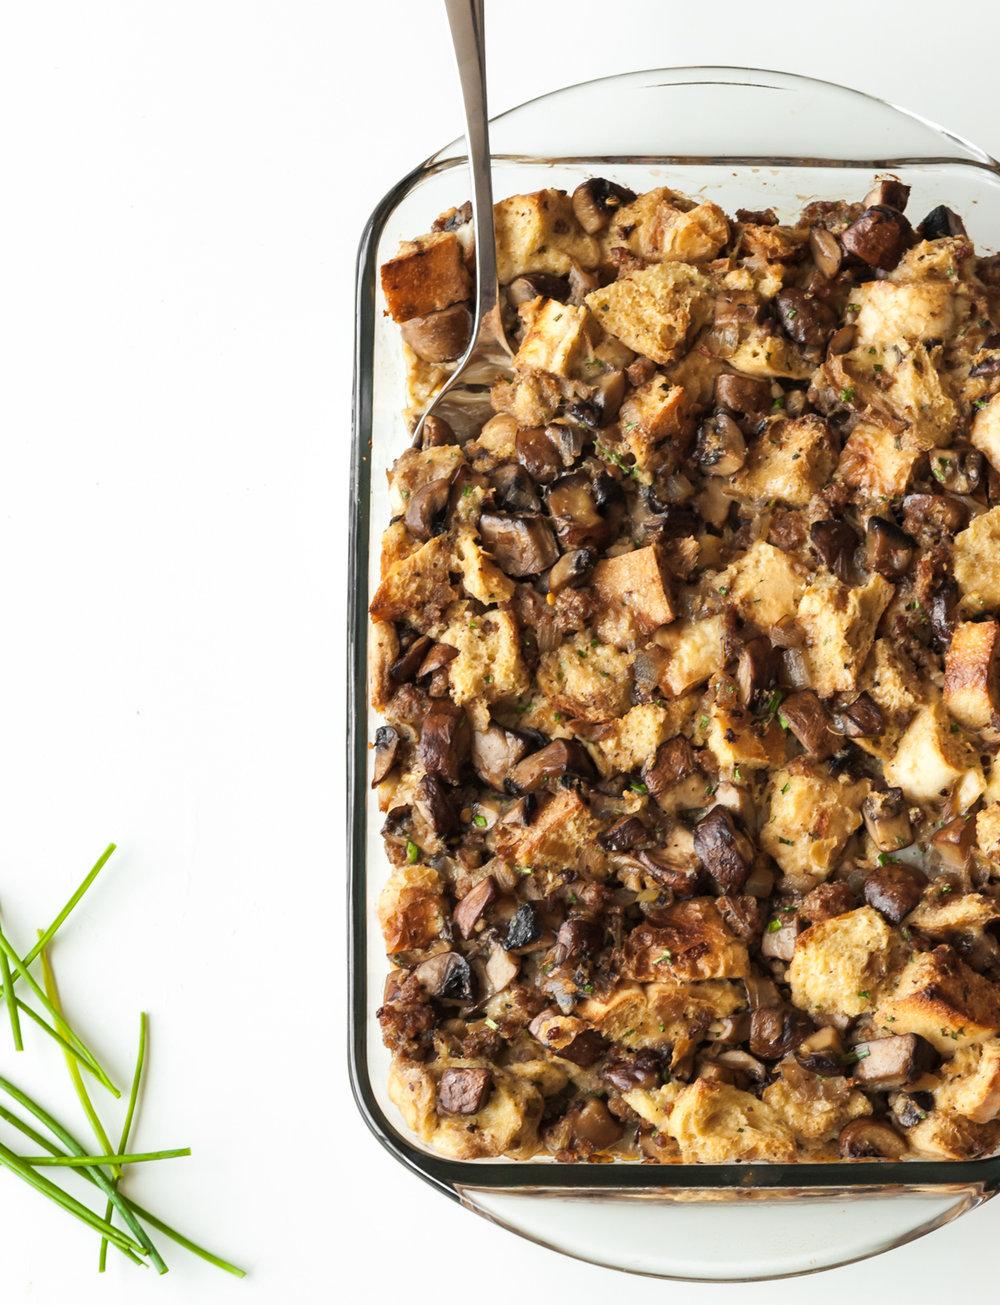 mushroom and sausage bread pudding